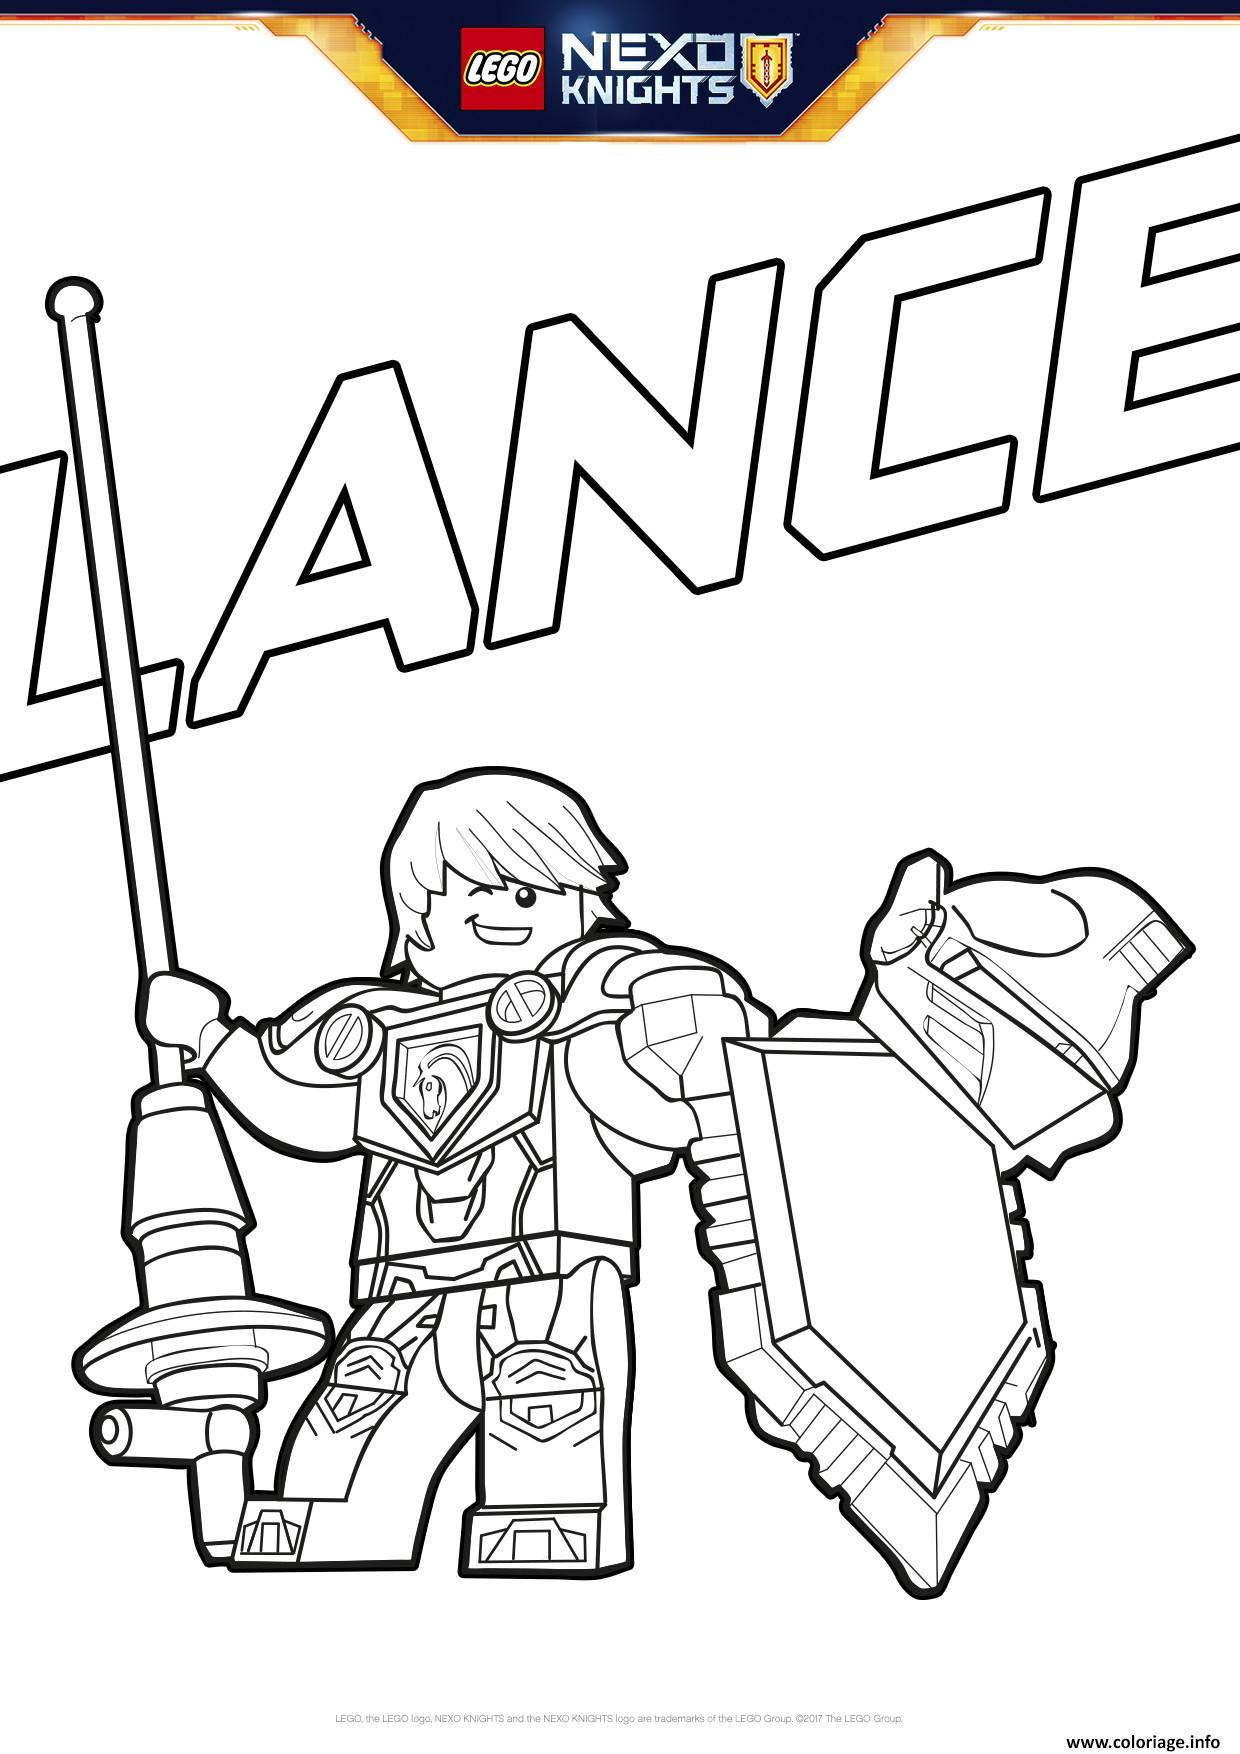 coloriage lego nexo knights bouclier lance dessin gratuit